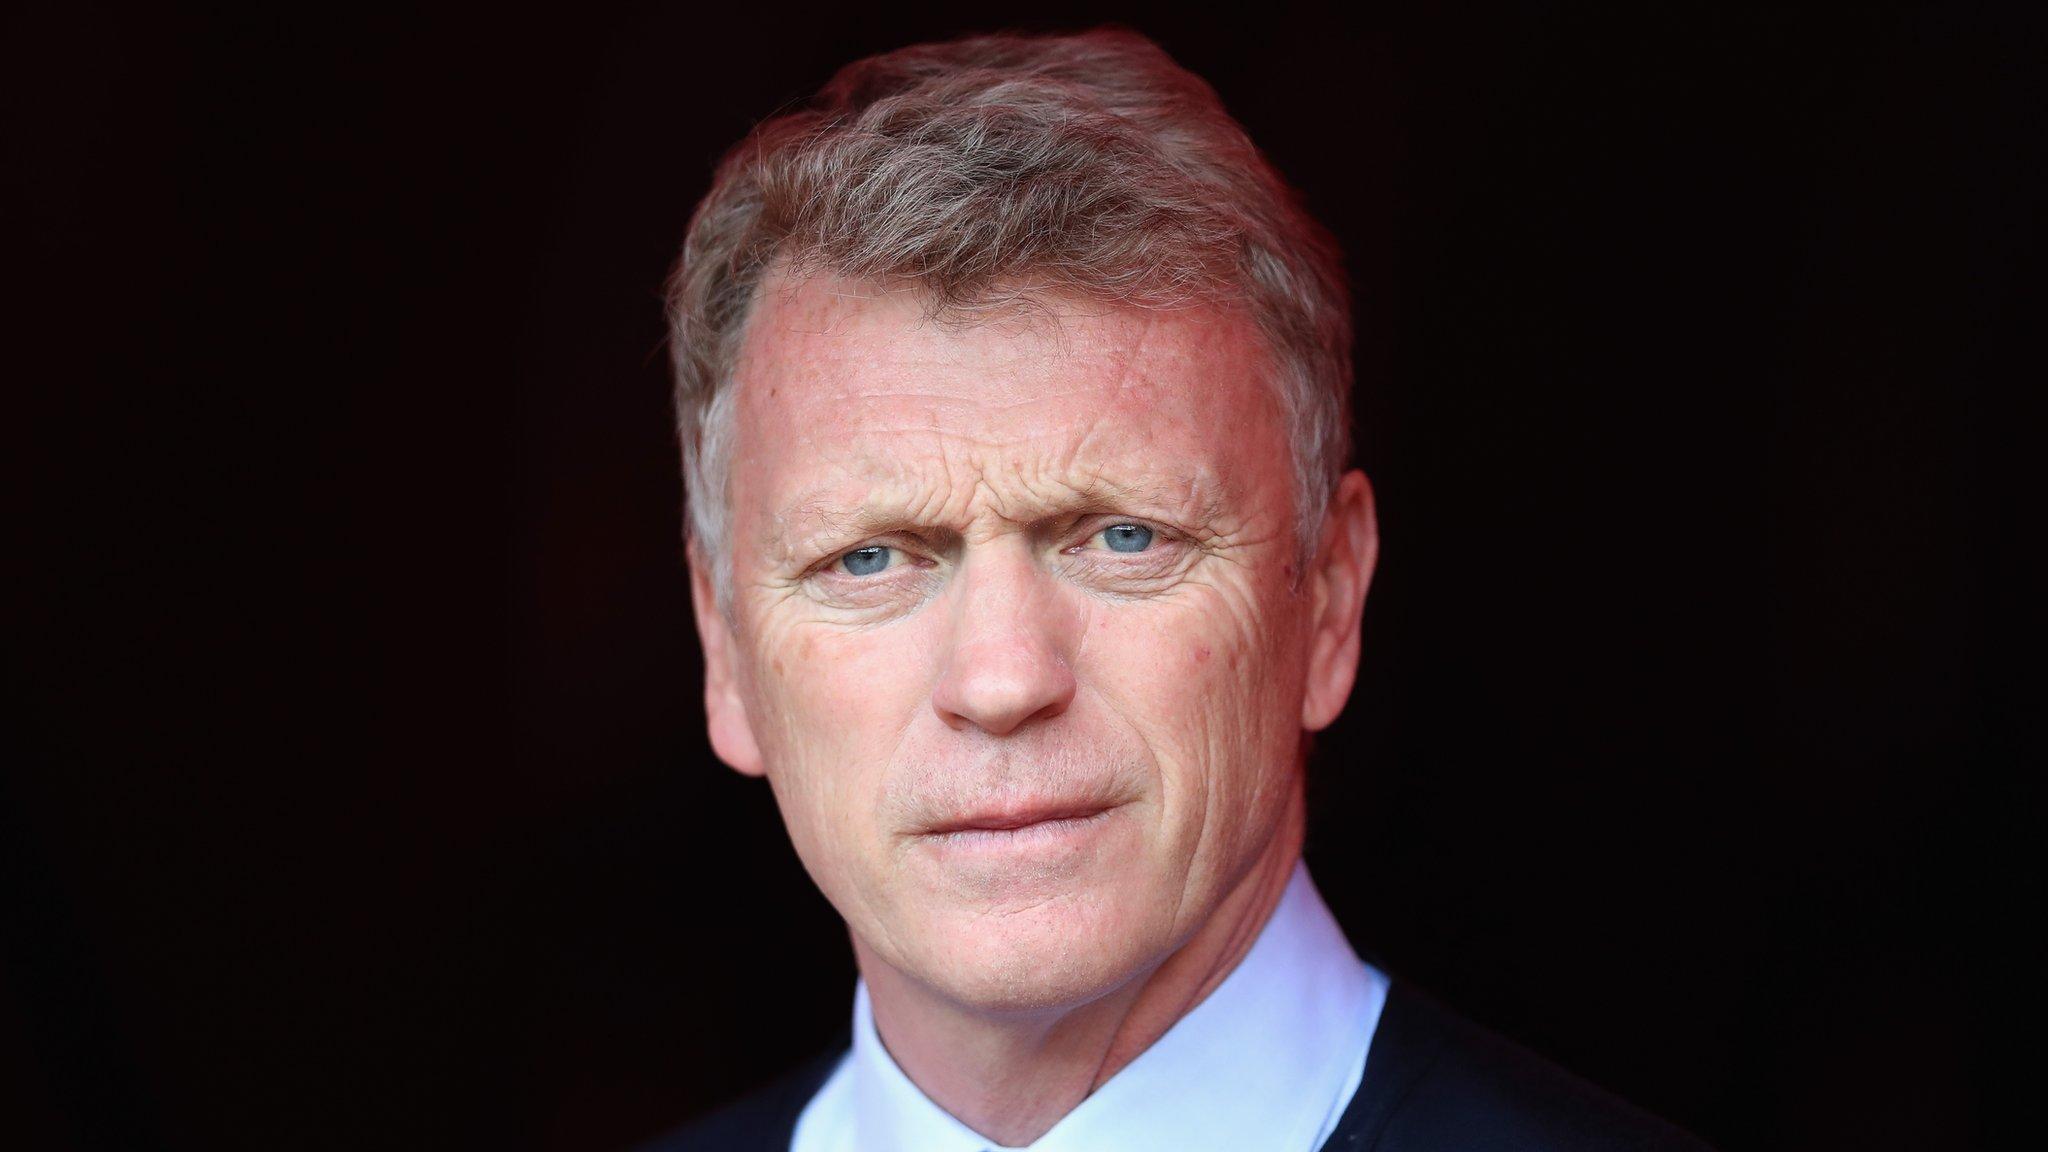 David Moyes: Sunderland manager charged over 'slap' comment